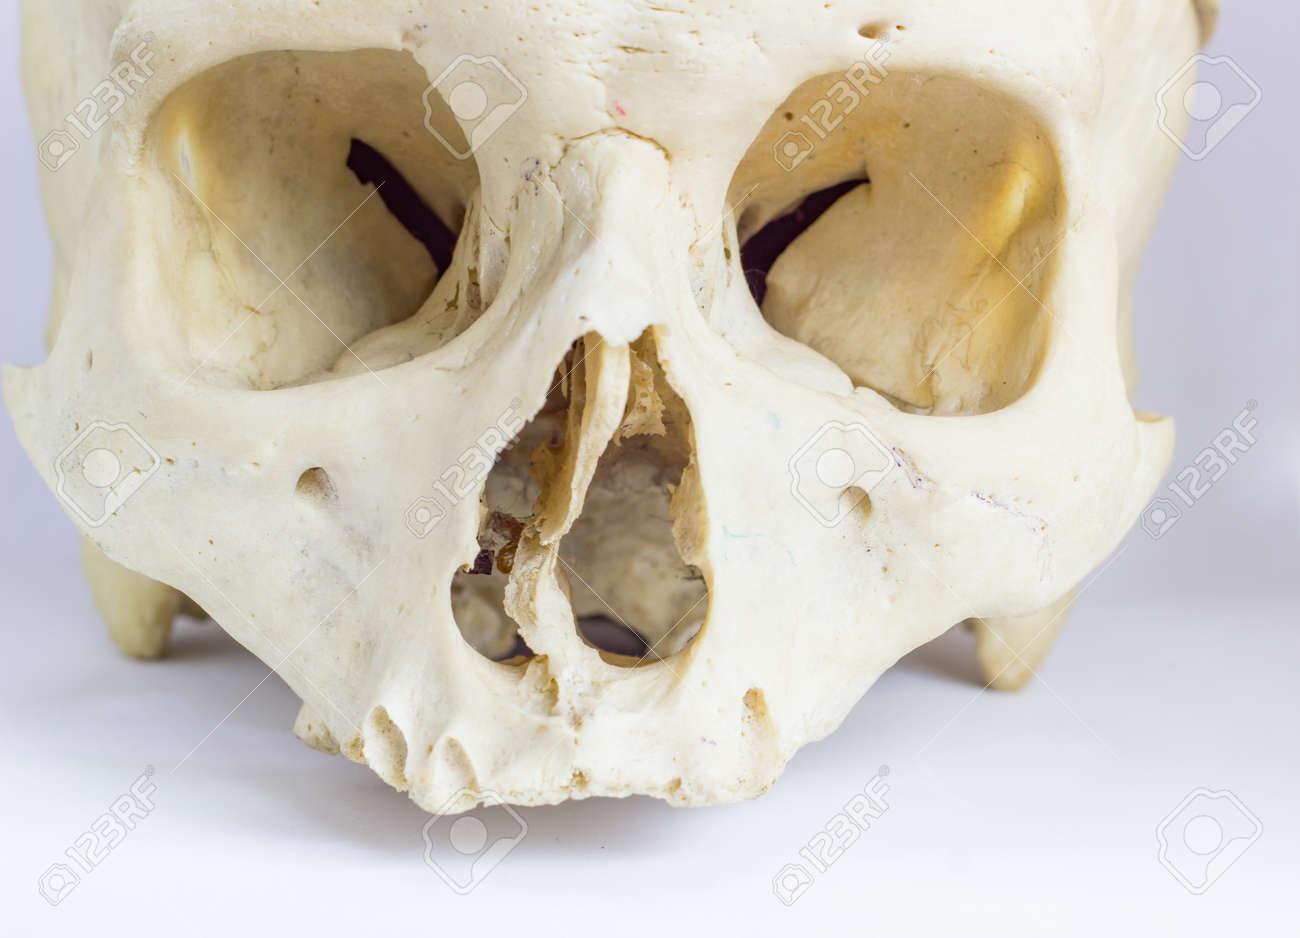 Close Up Macro View Of Human Skull Bone Showing The Anatomy Of